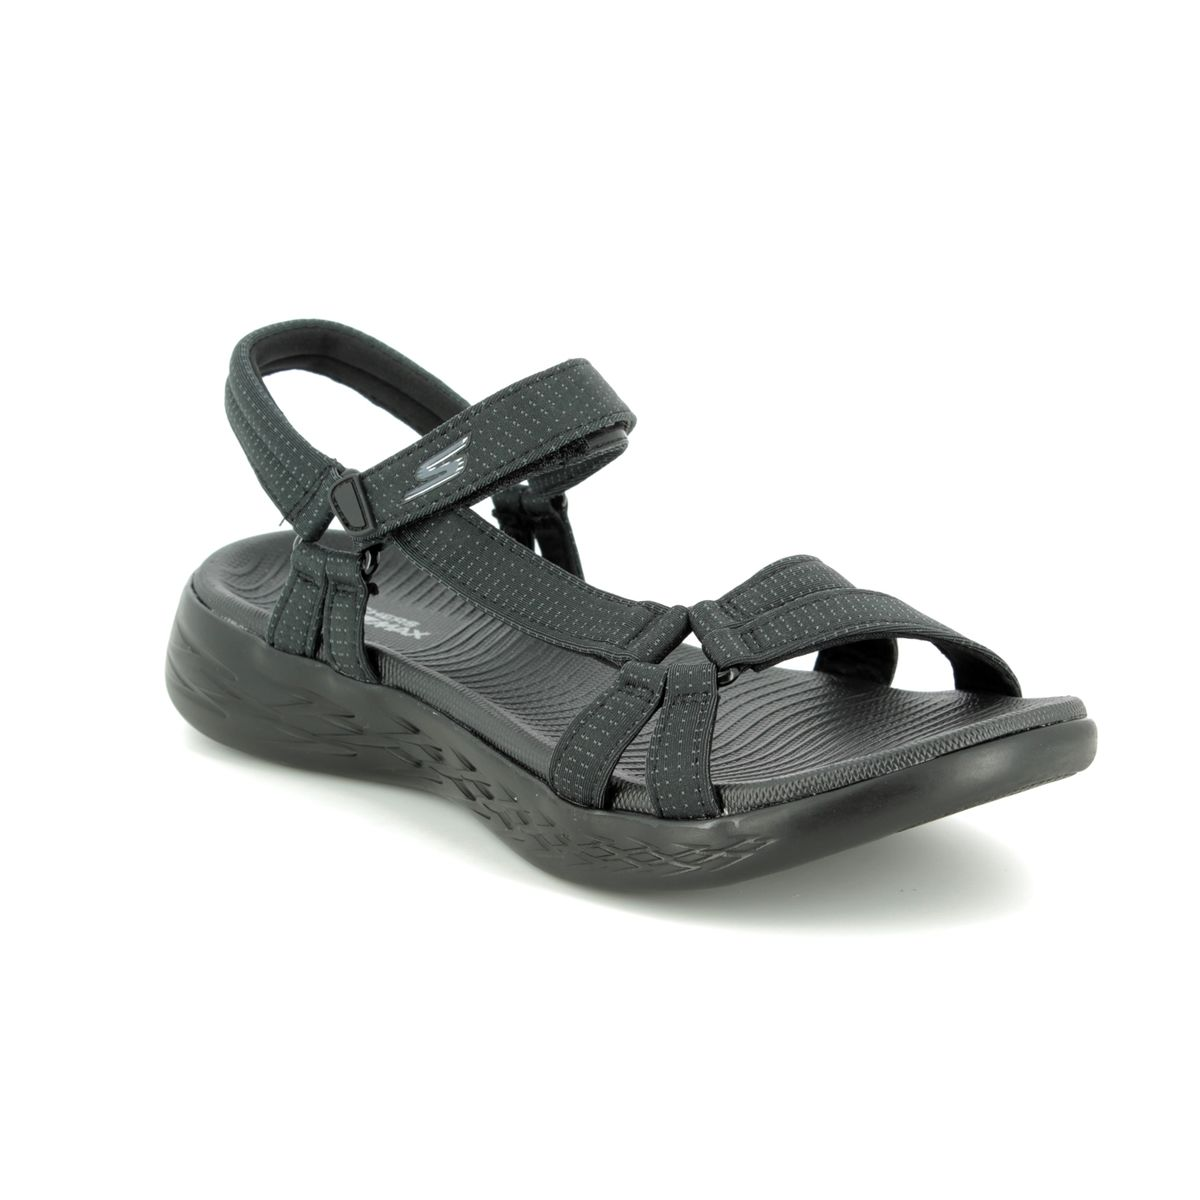 5057797bb8d7 Skechers Brilliancy 15316 BBK Black Walking Sandals